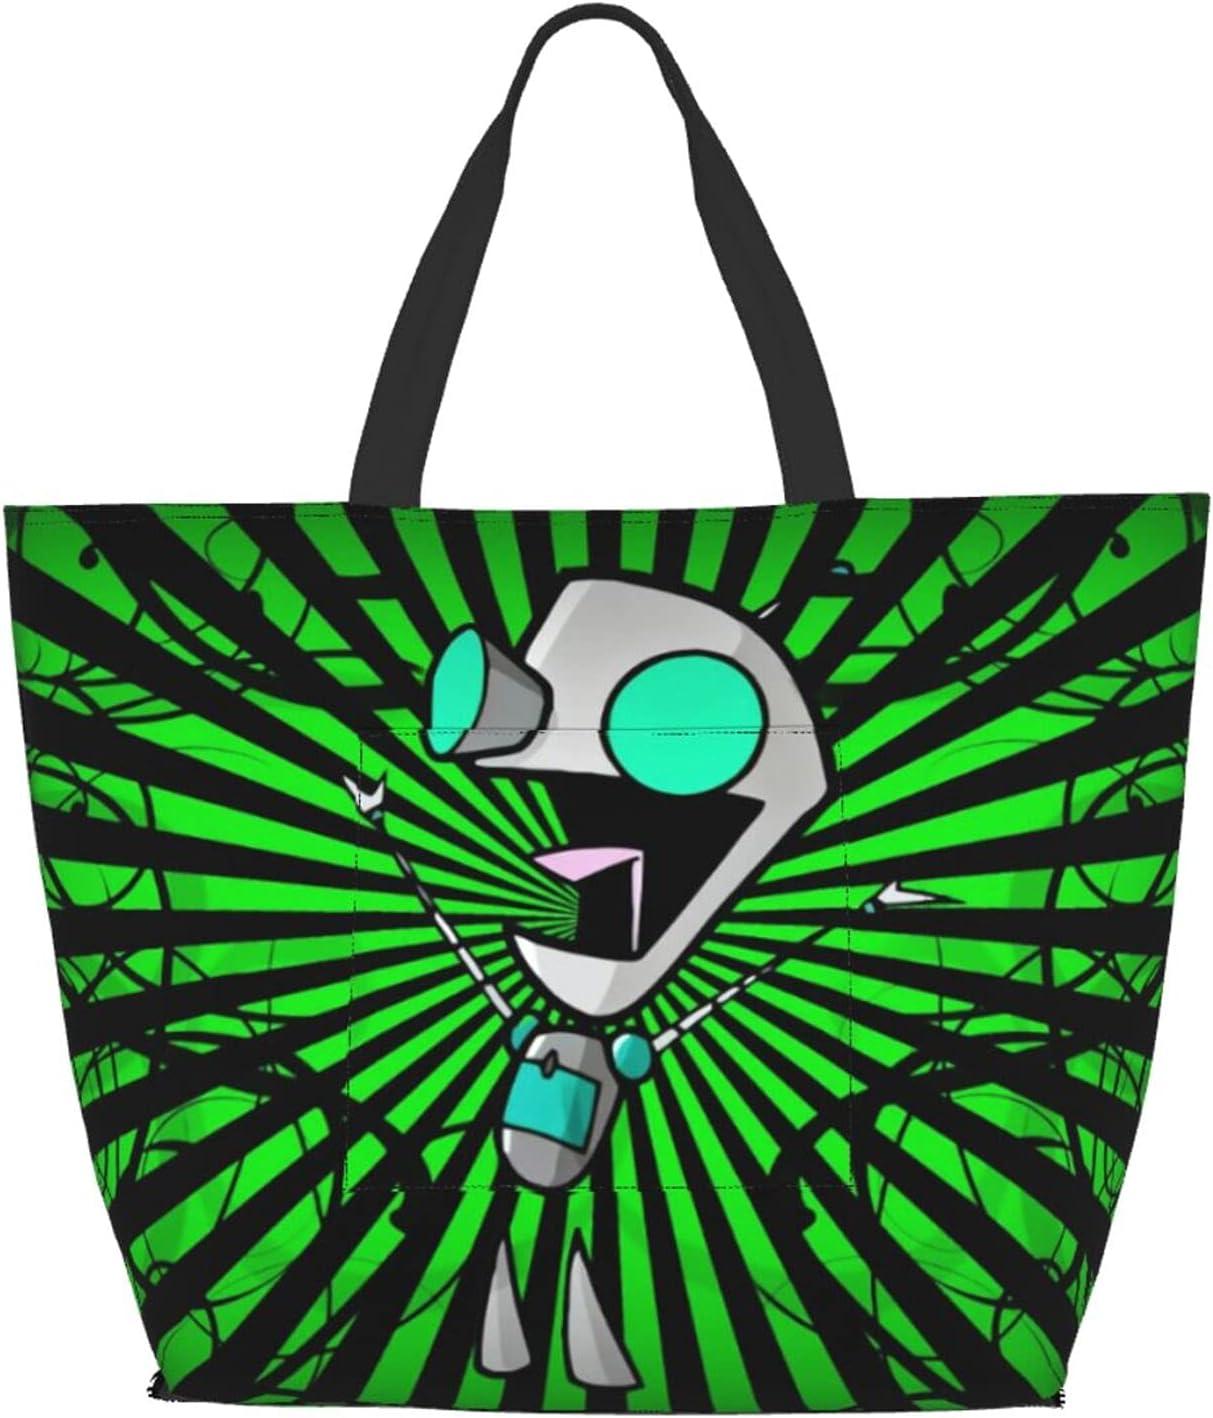 Invader Zim Shoulder Travel Bag Wear Capac Big High quality Max 60% OFF new Tote